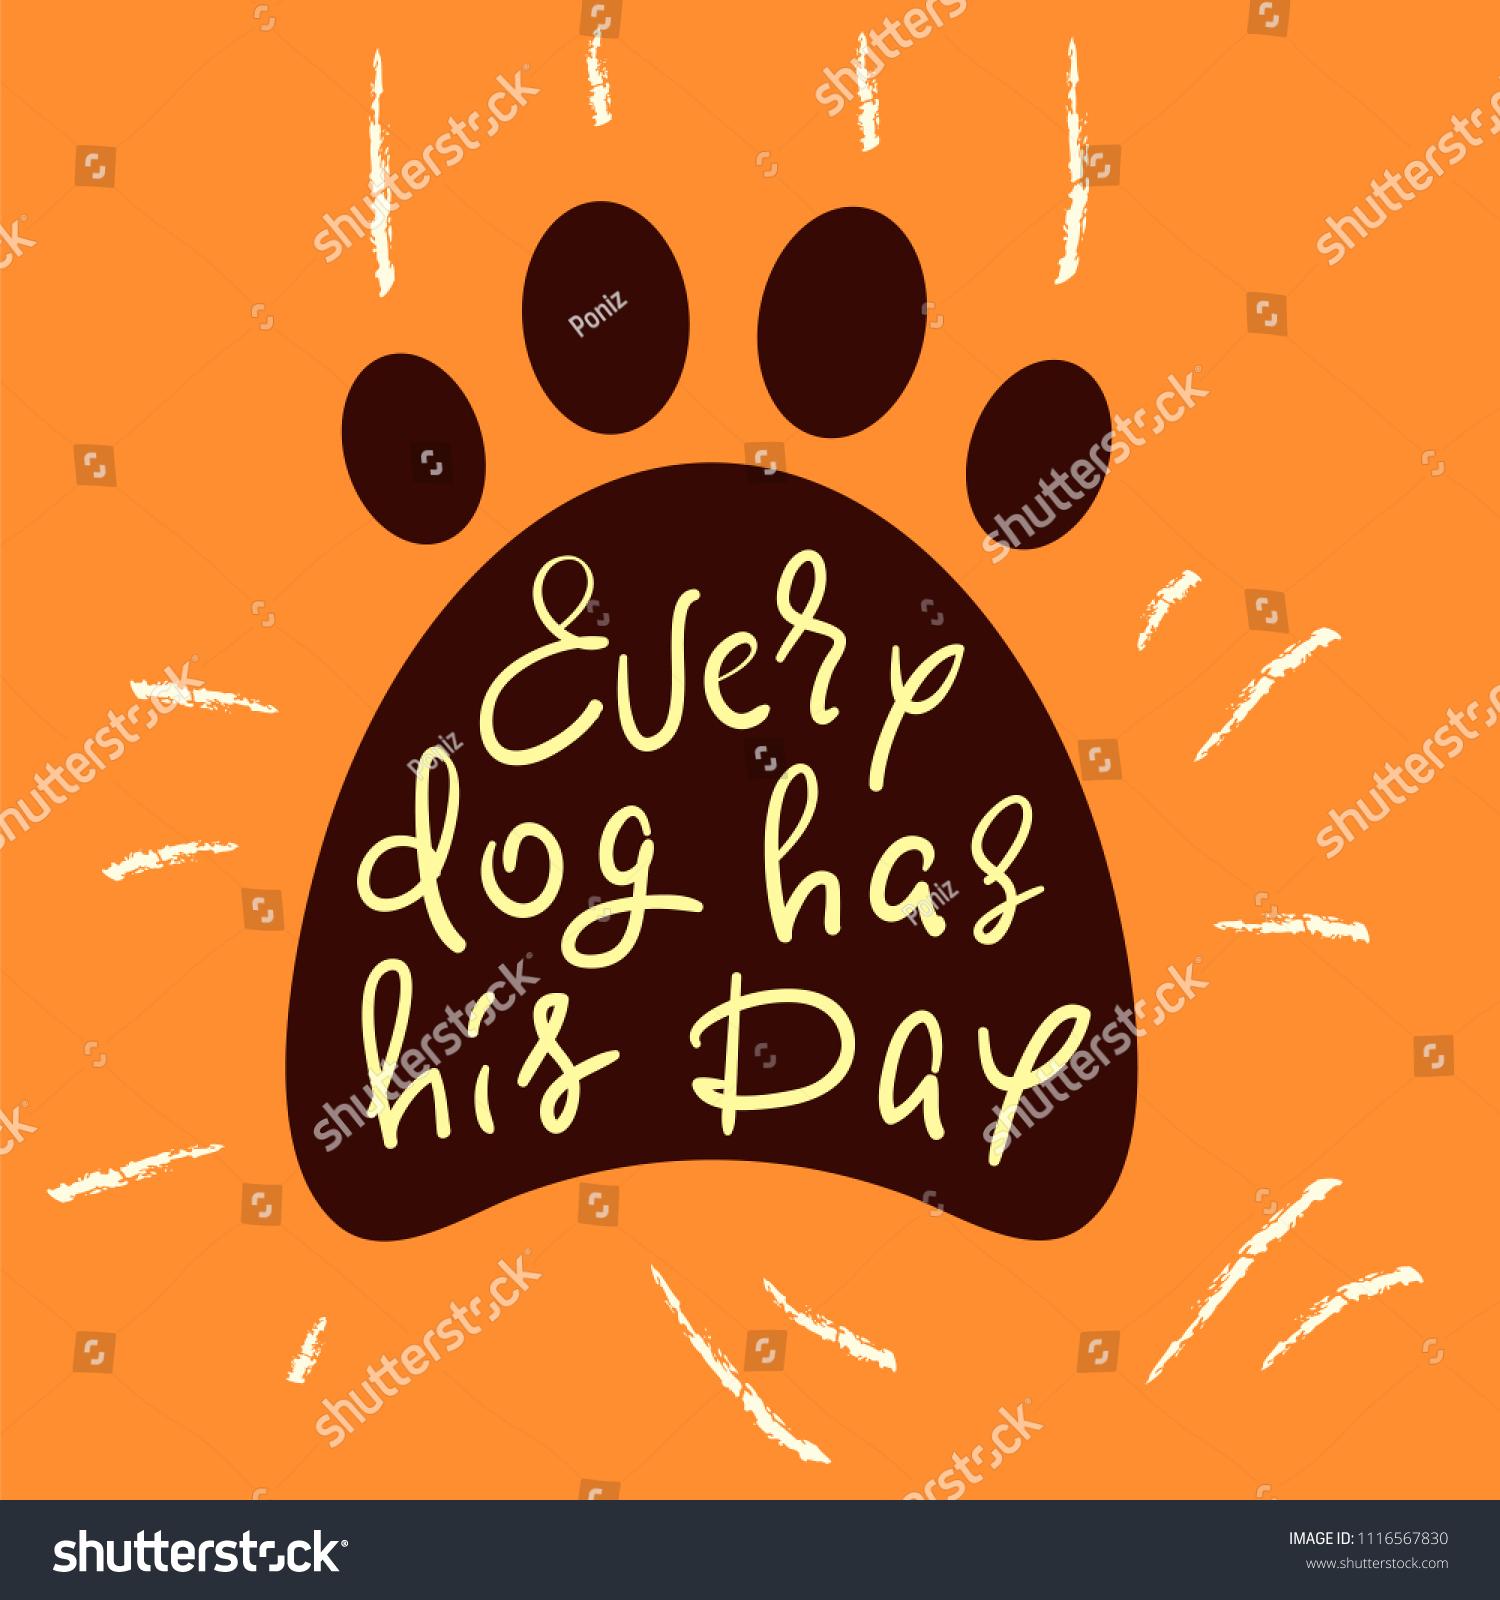 Every Dog Has His Day Handwritten Stock Vector 1116567830 Shutterstock